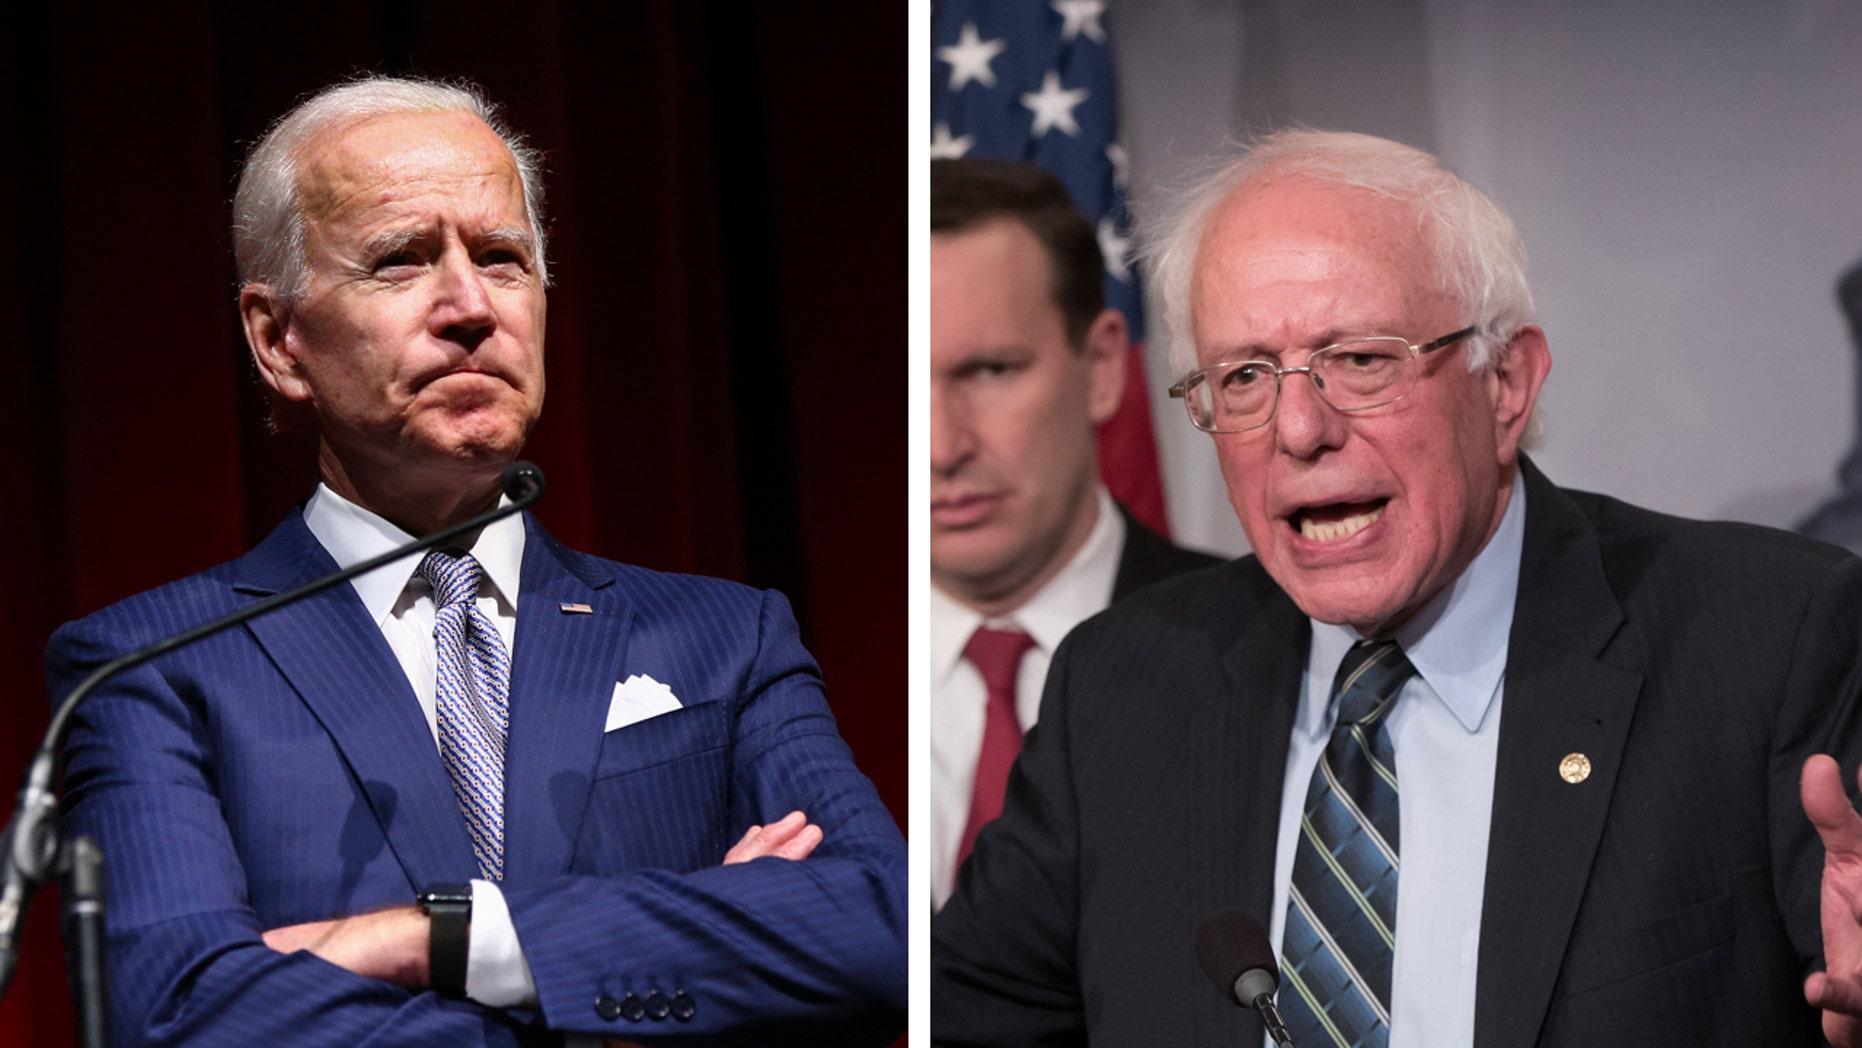 Biden, Sanders viewed as top 2020 contenders among Iowa's Democratic voters: poll